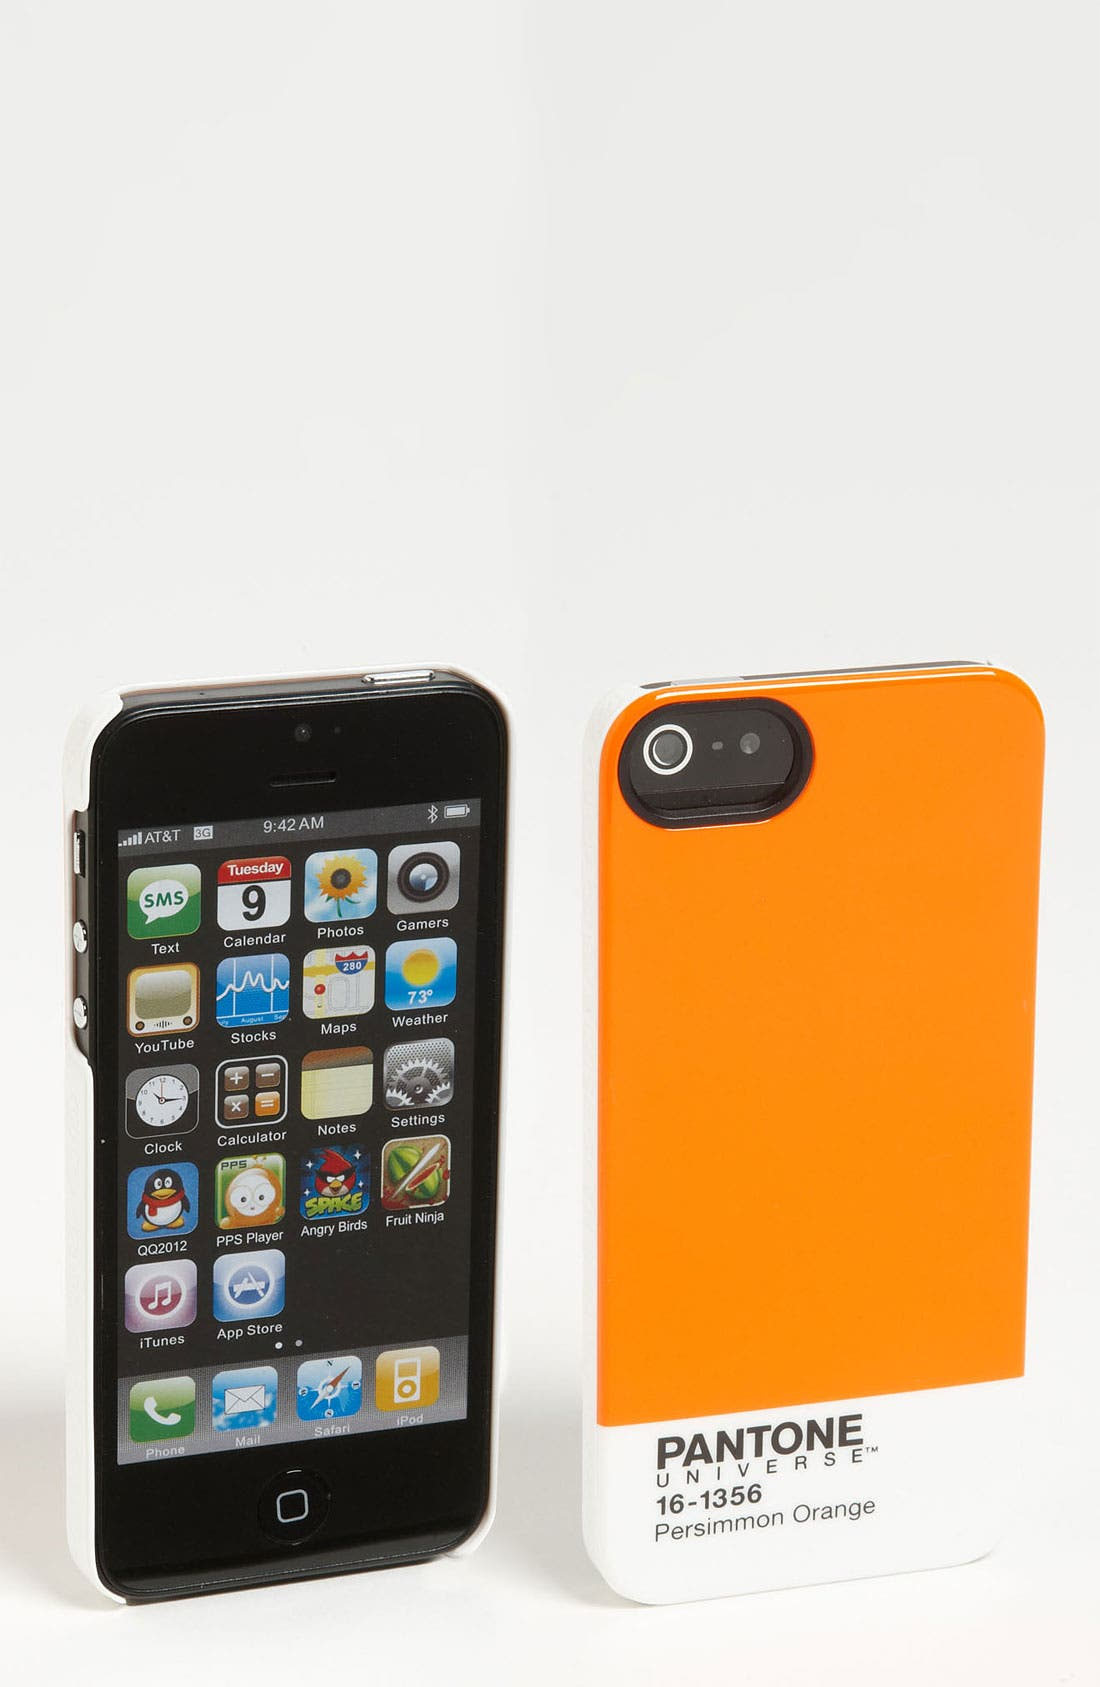 Main Image - Case Scenario 'Pantone® Universe' iPhone 5 Case